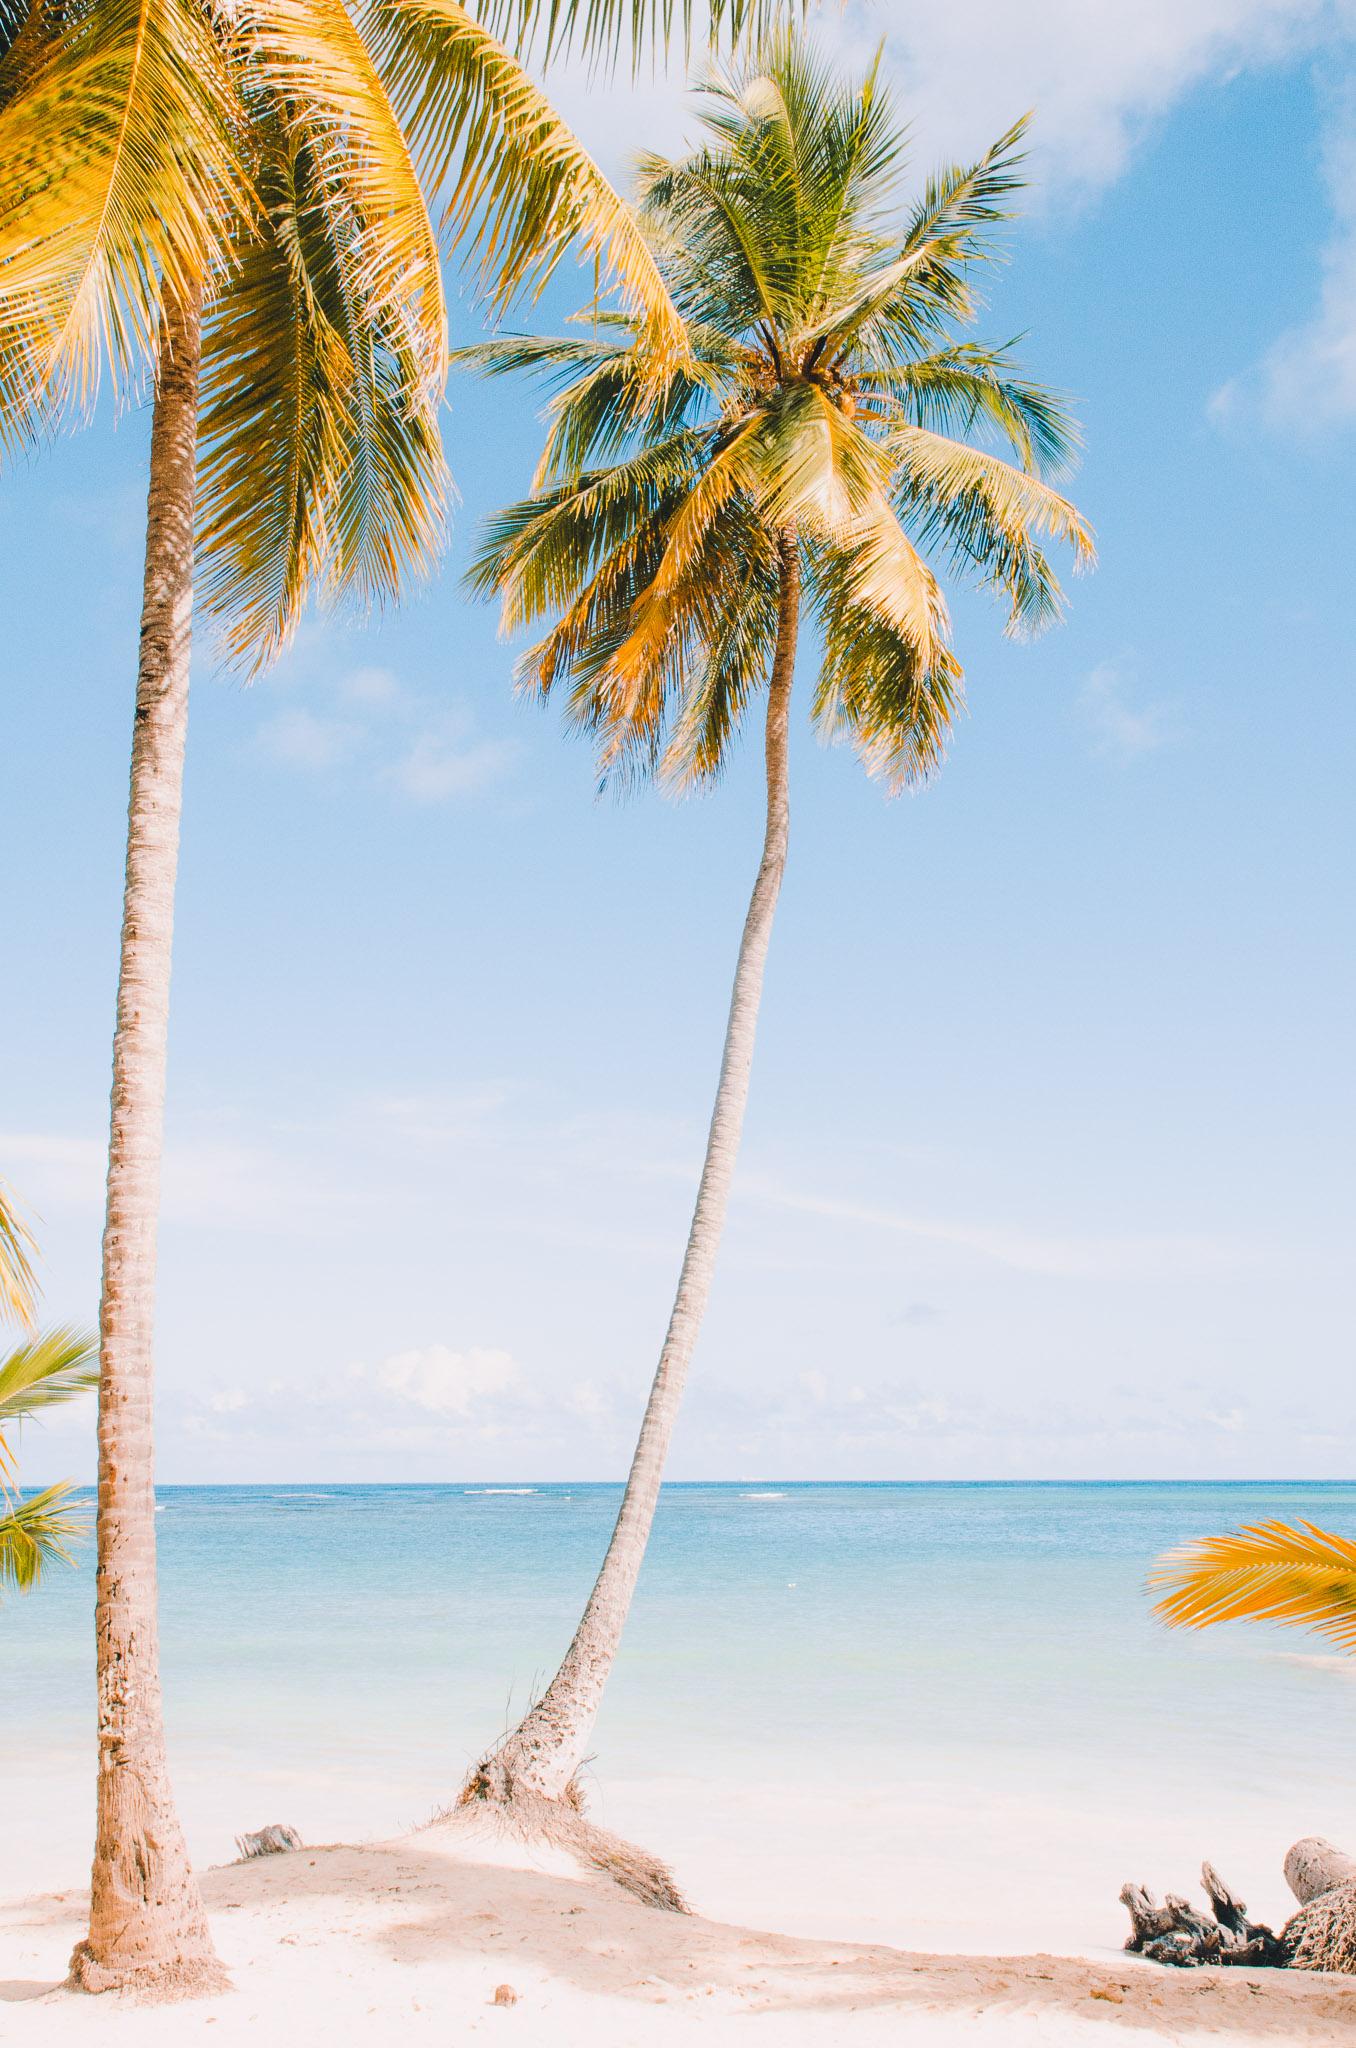 dominican-republic-2.jpg